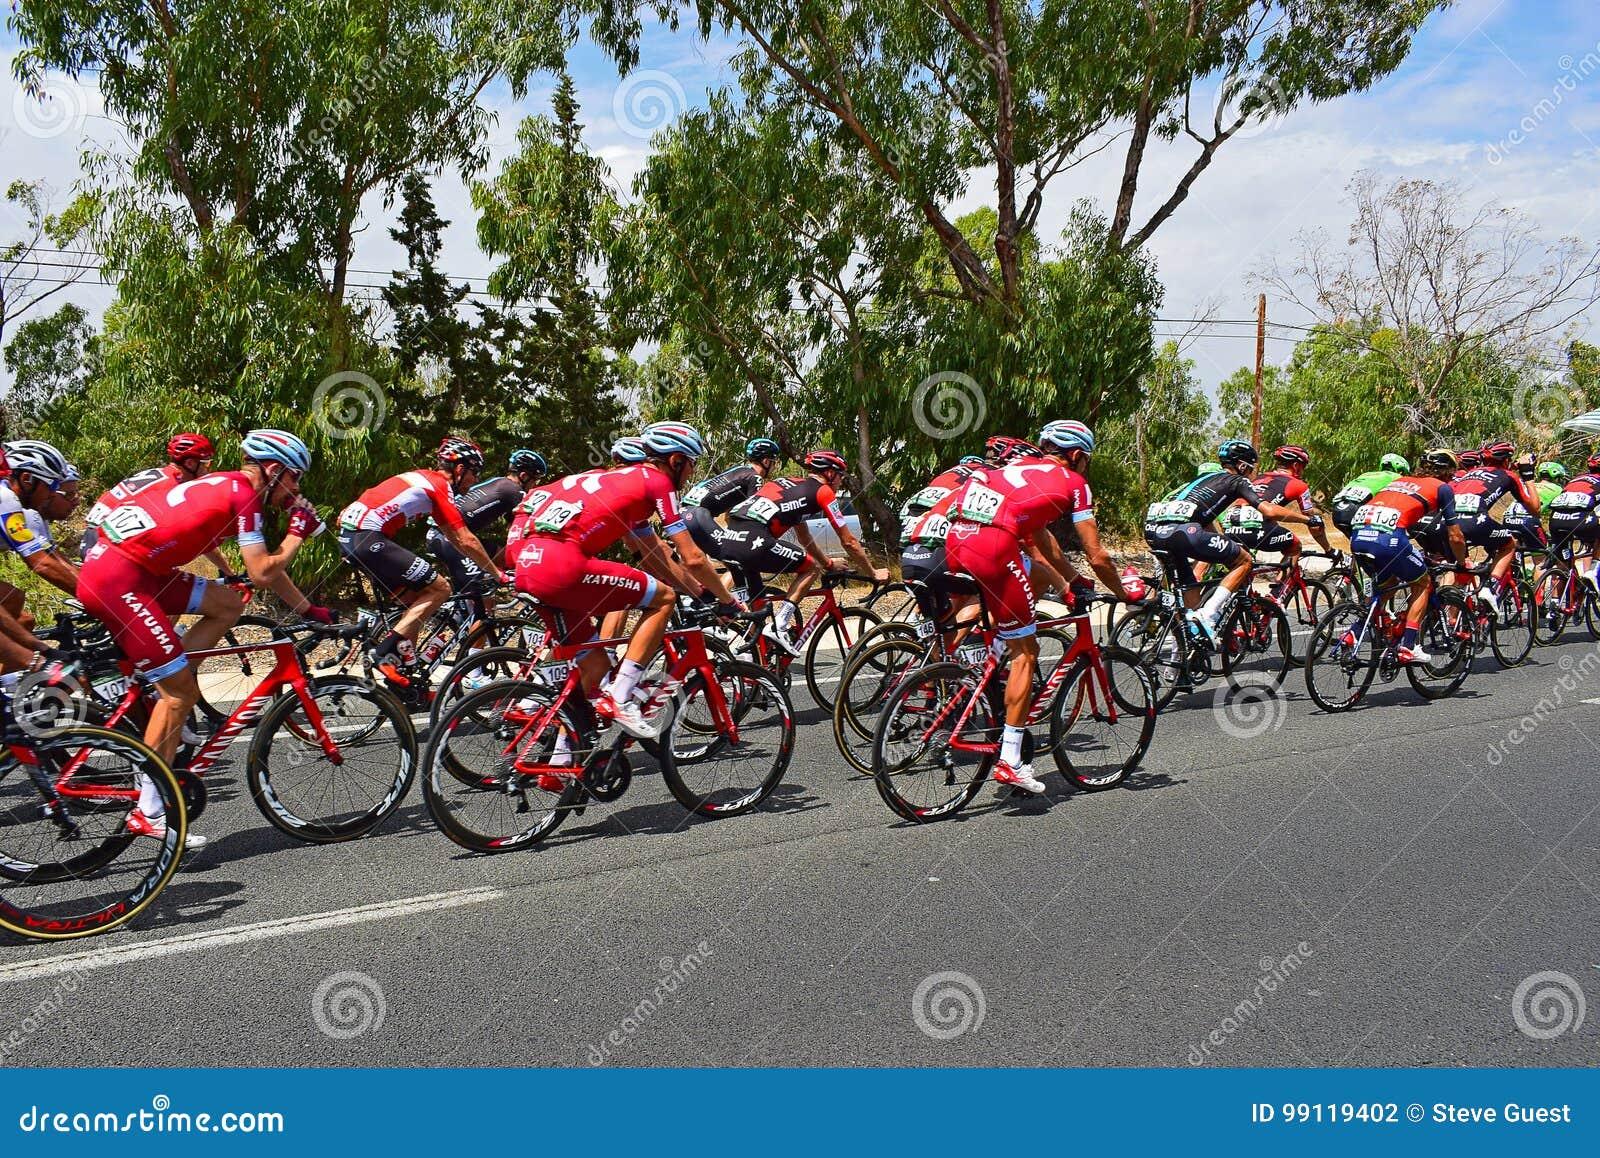 Team katusha Alpecine In The Peleton La Vuelta España